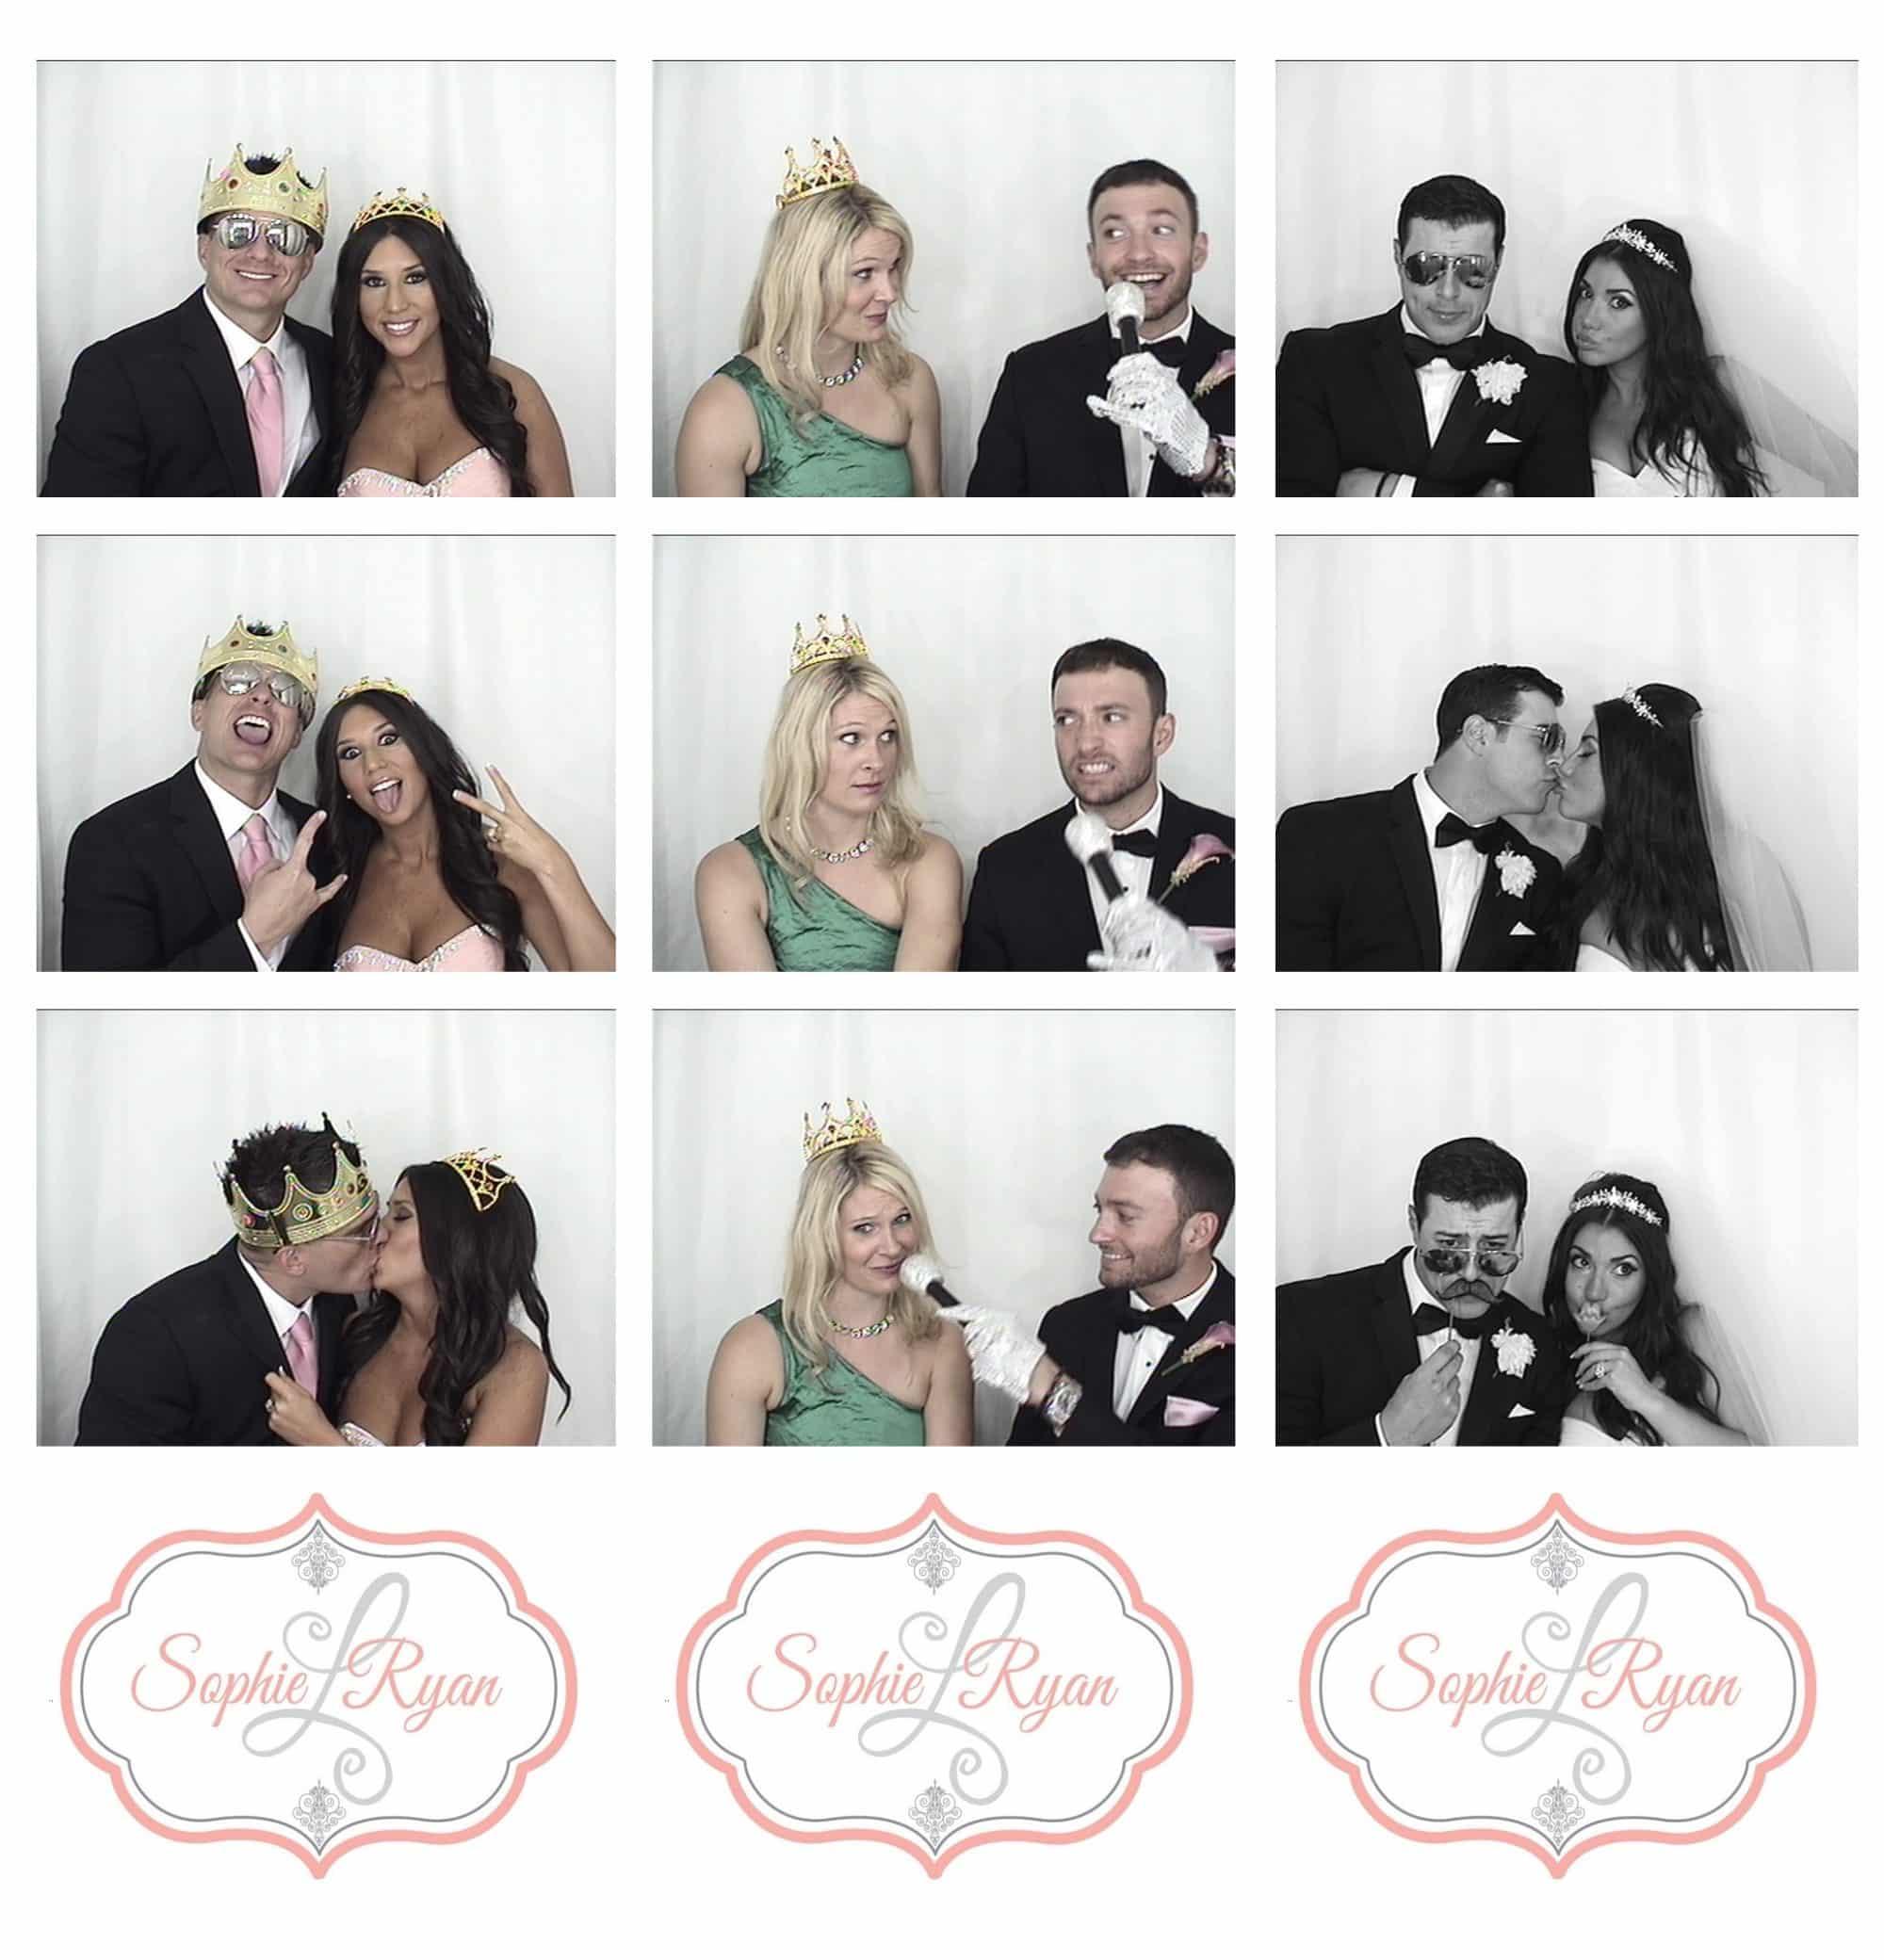 Sophie + Ryan wedding playing in photobooth